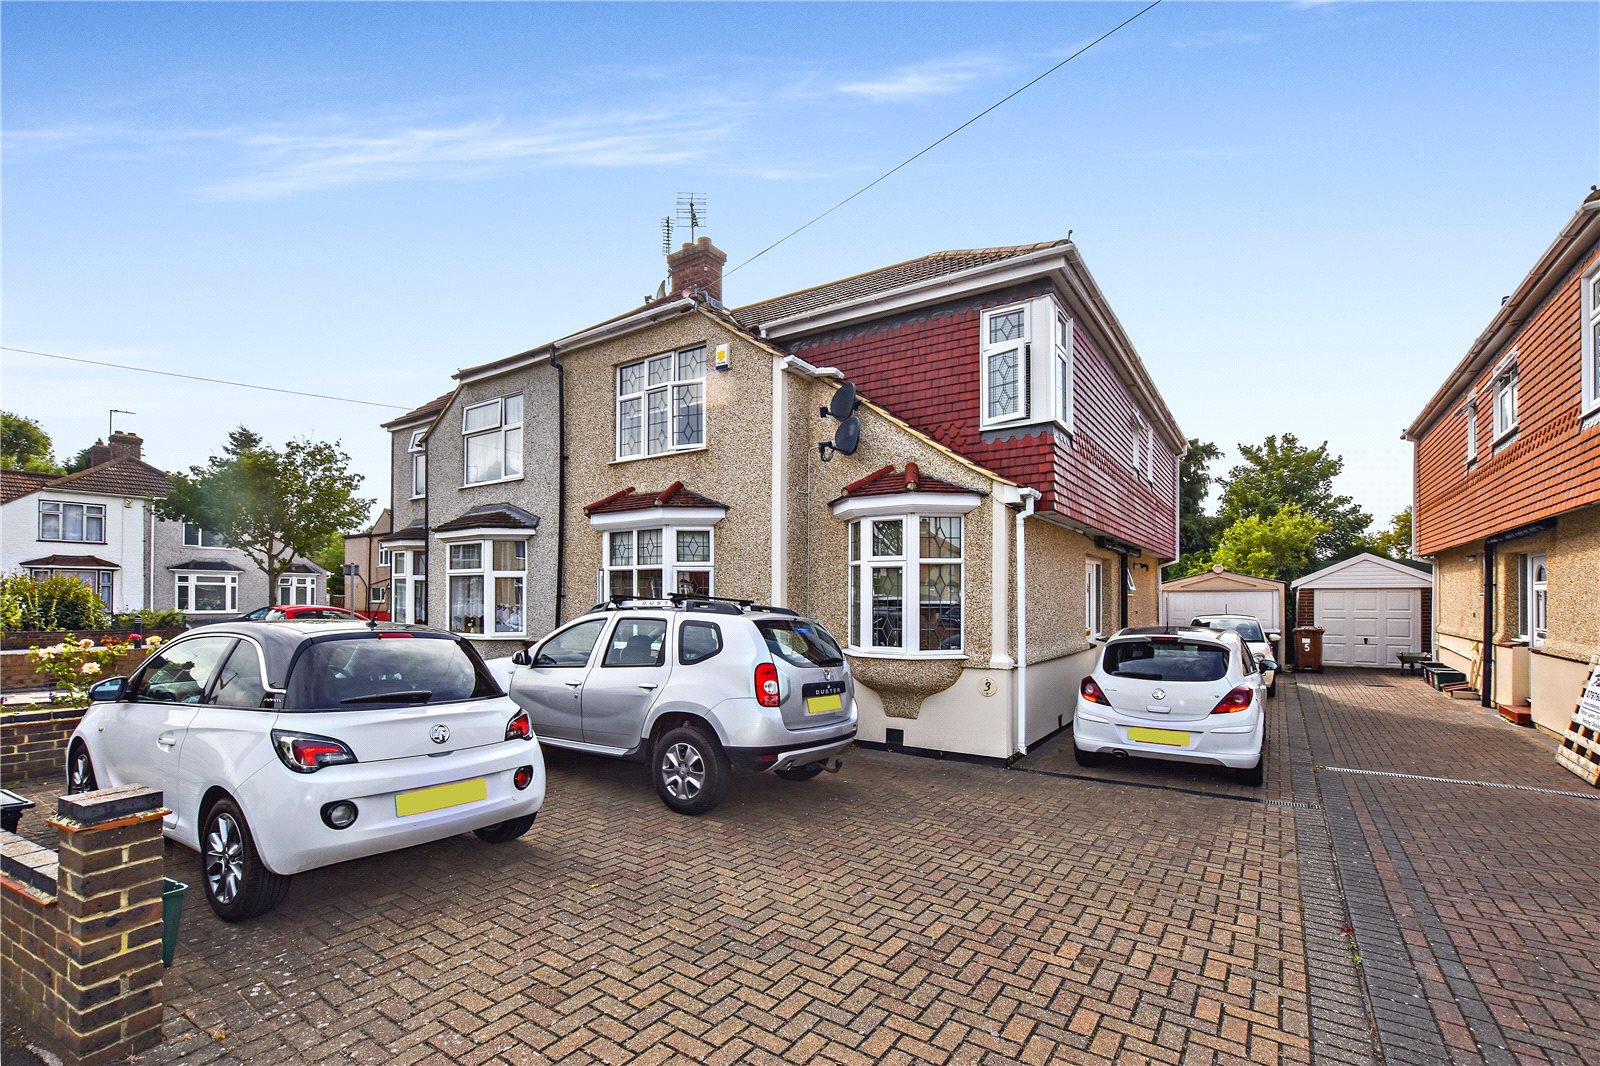 Palmar Crescent, Bexleyheath, Kent, DA7